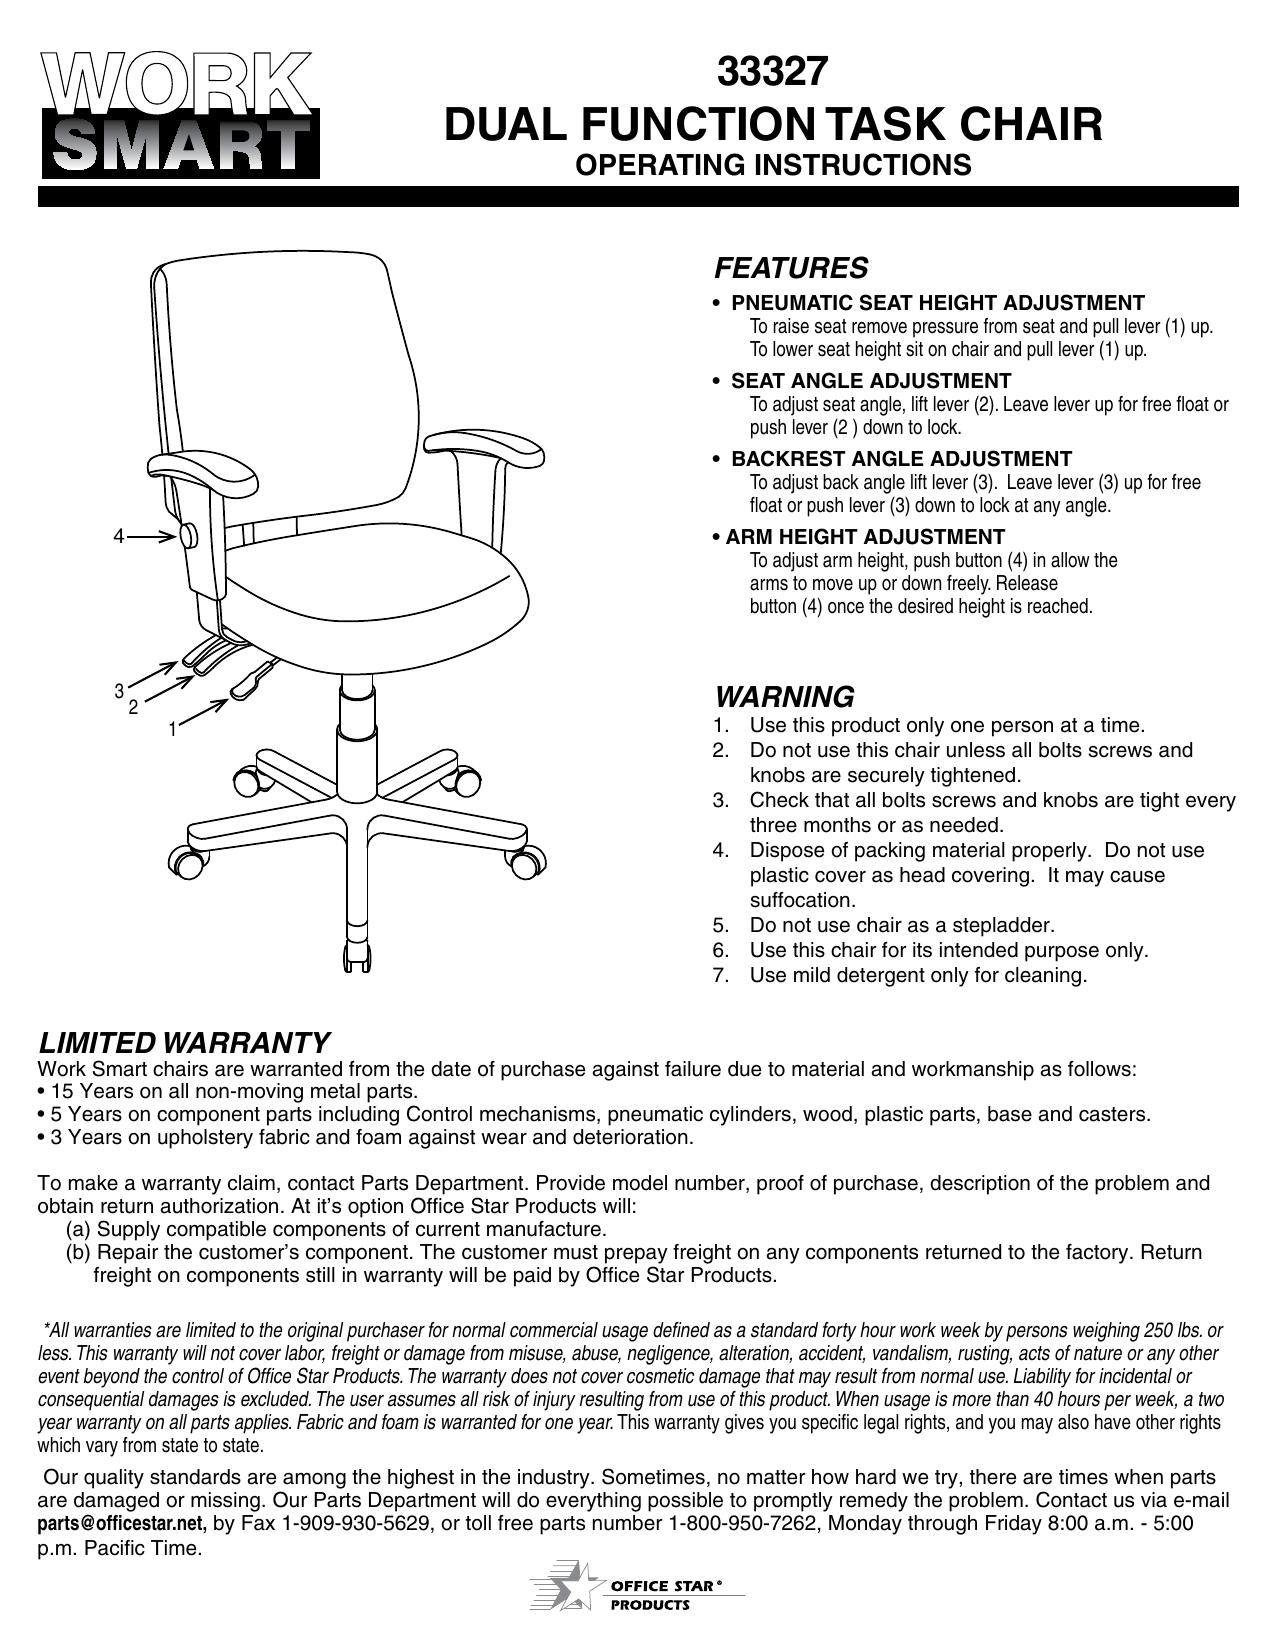 33327 Dual Function Task Chair Manualzz